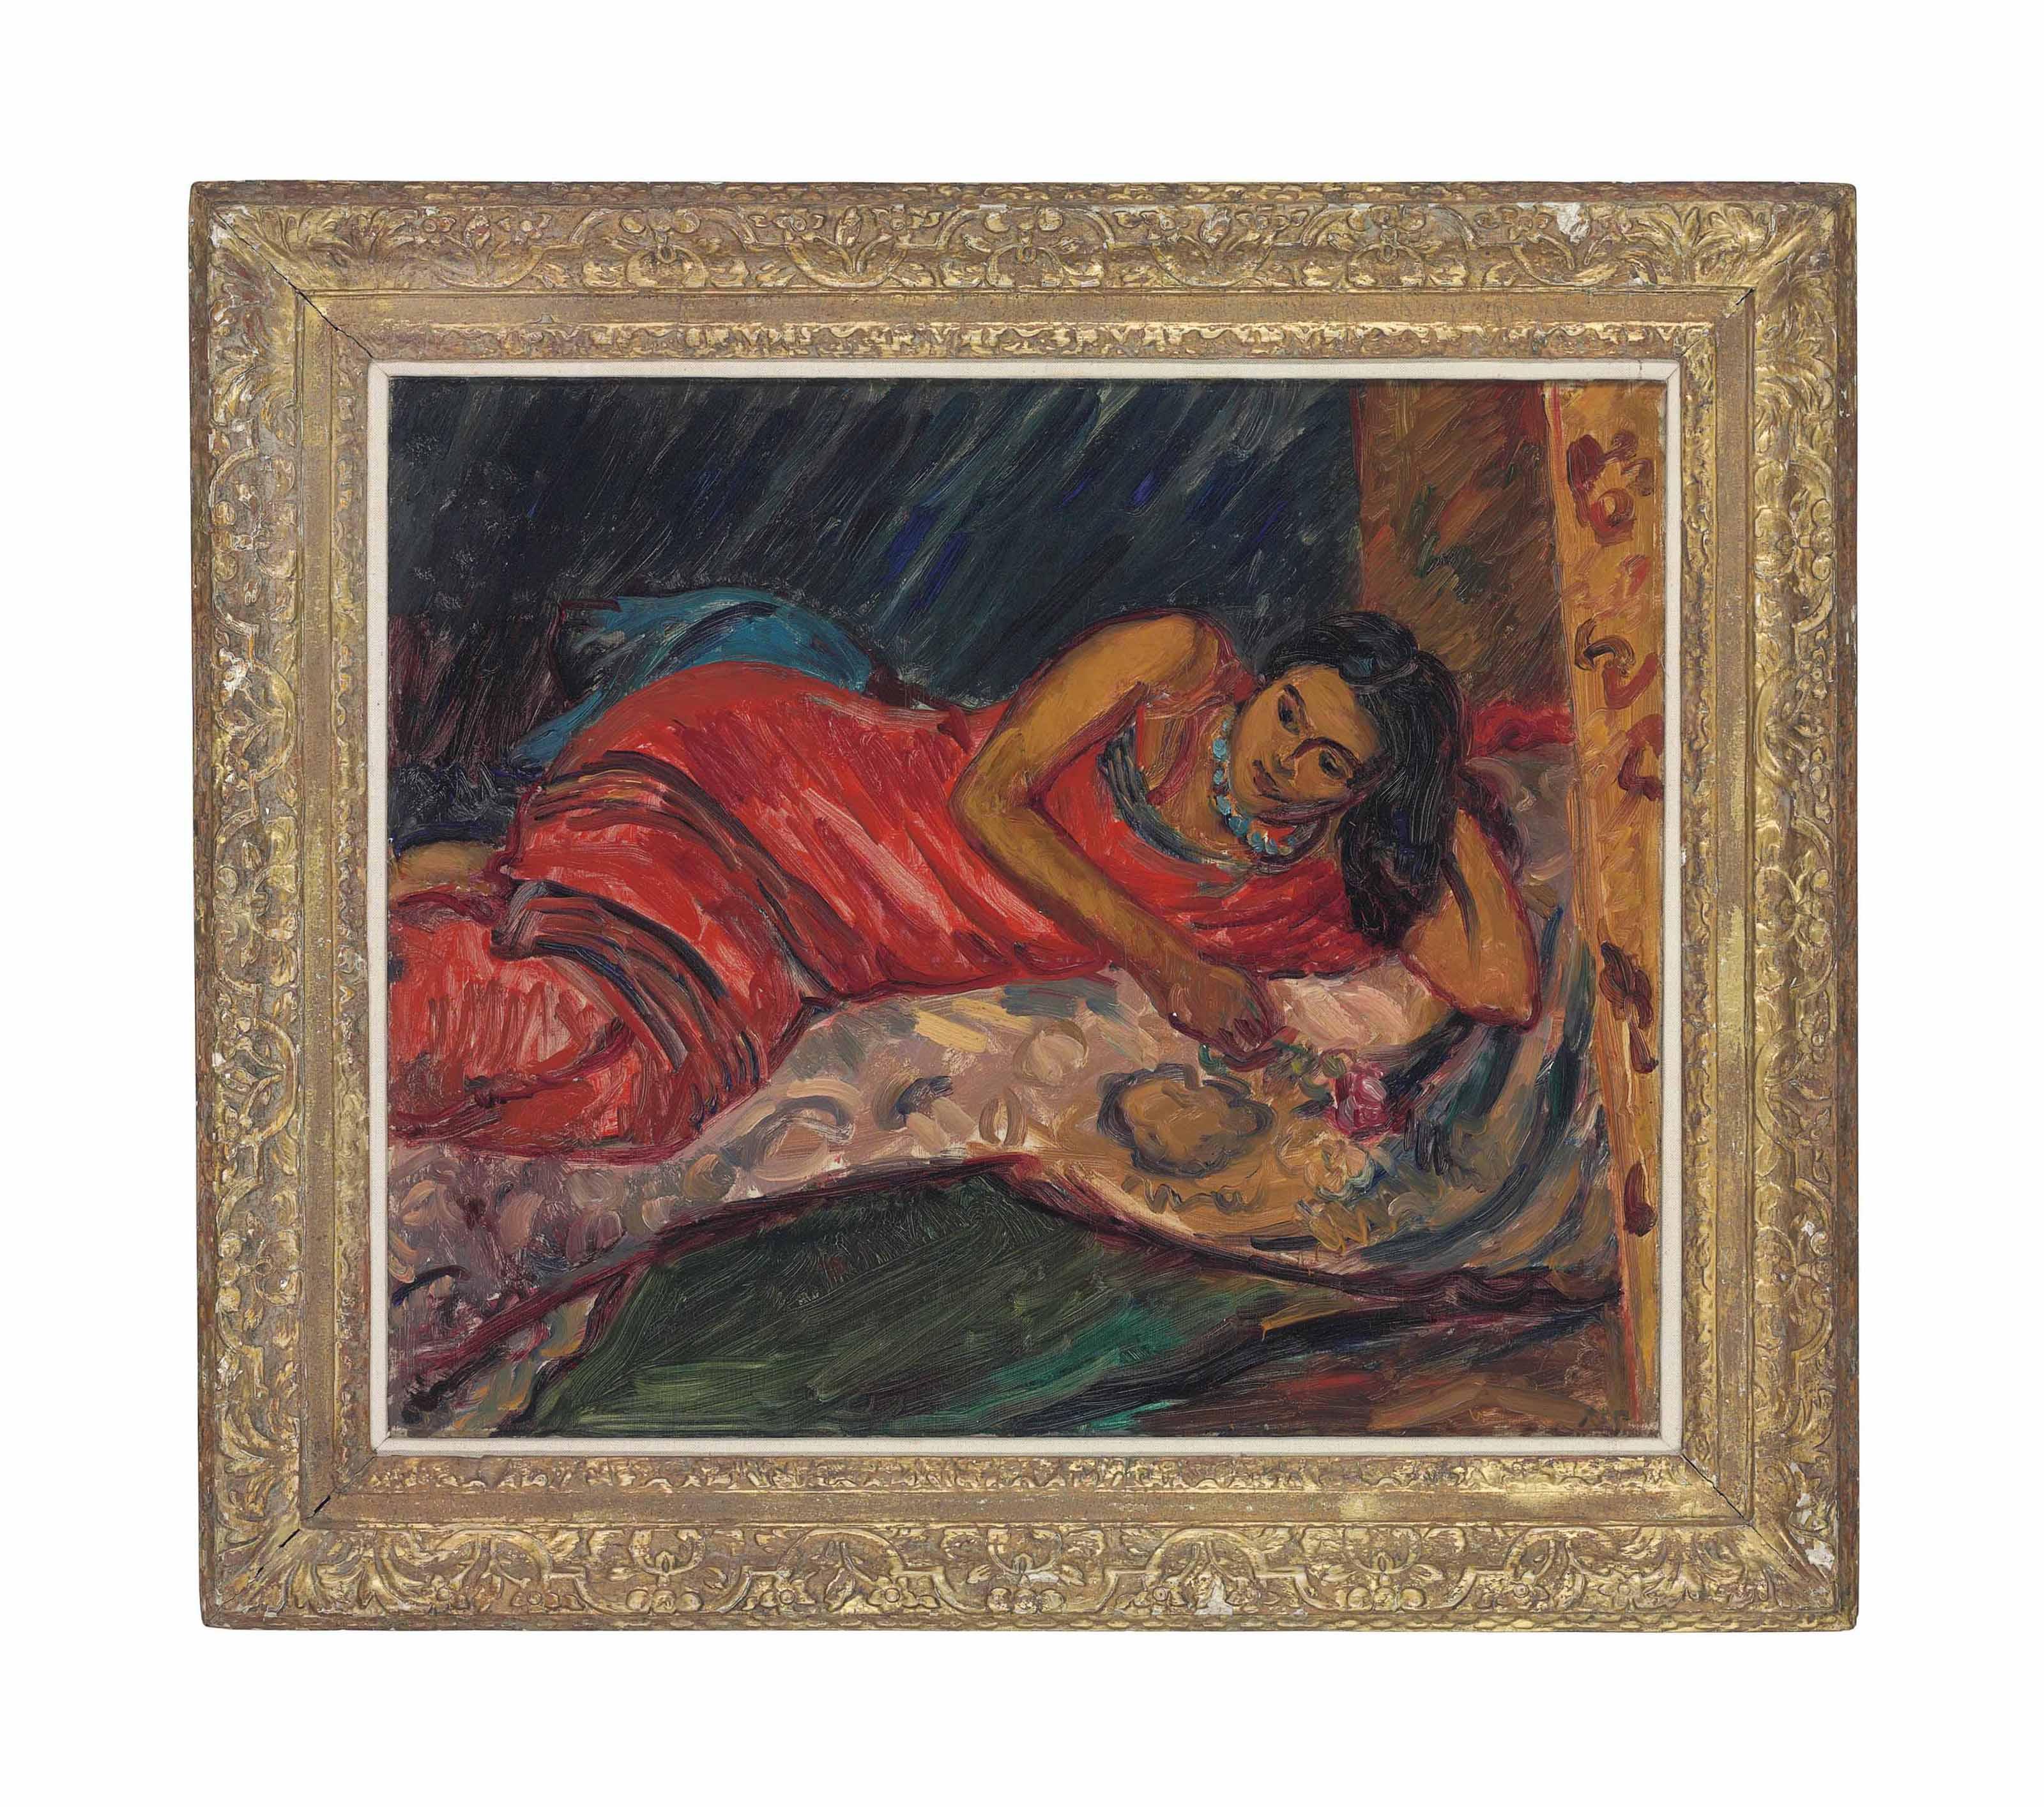 The Red Sari, Sunita Reclining